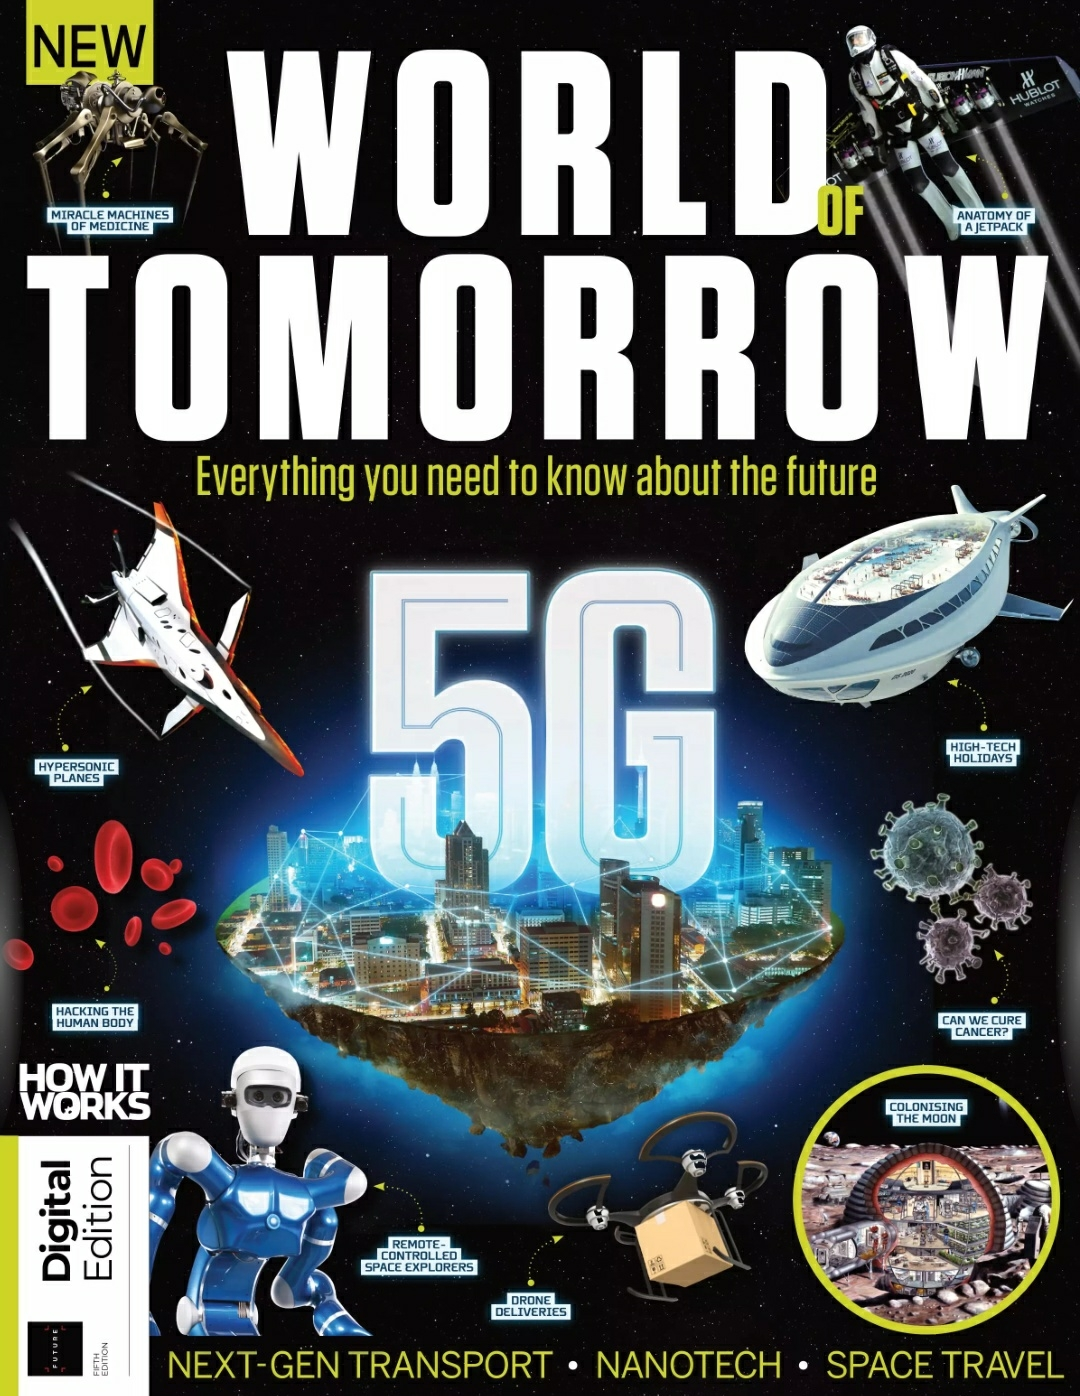 Обложка майского номера журнала How It Works от 2021 г.